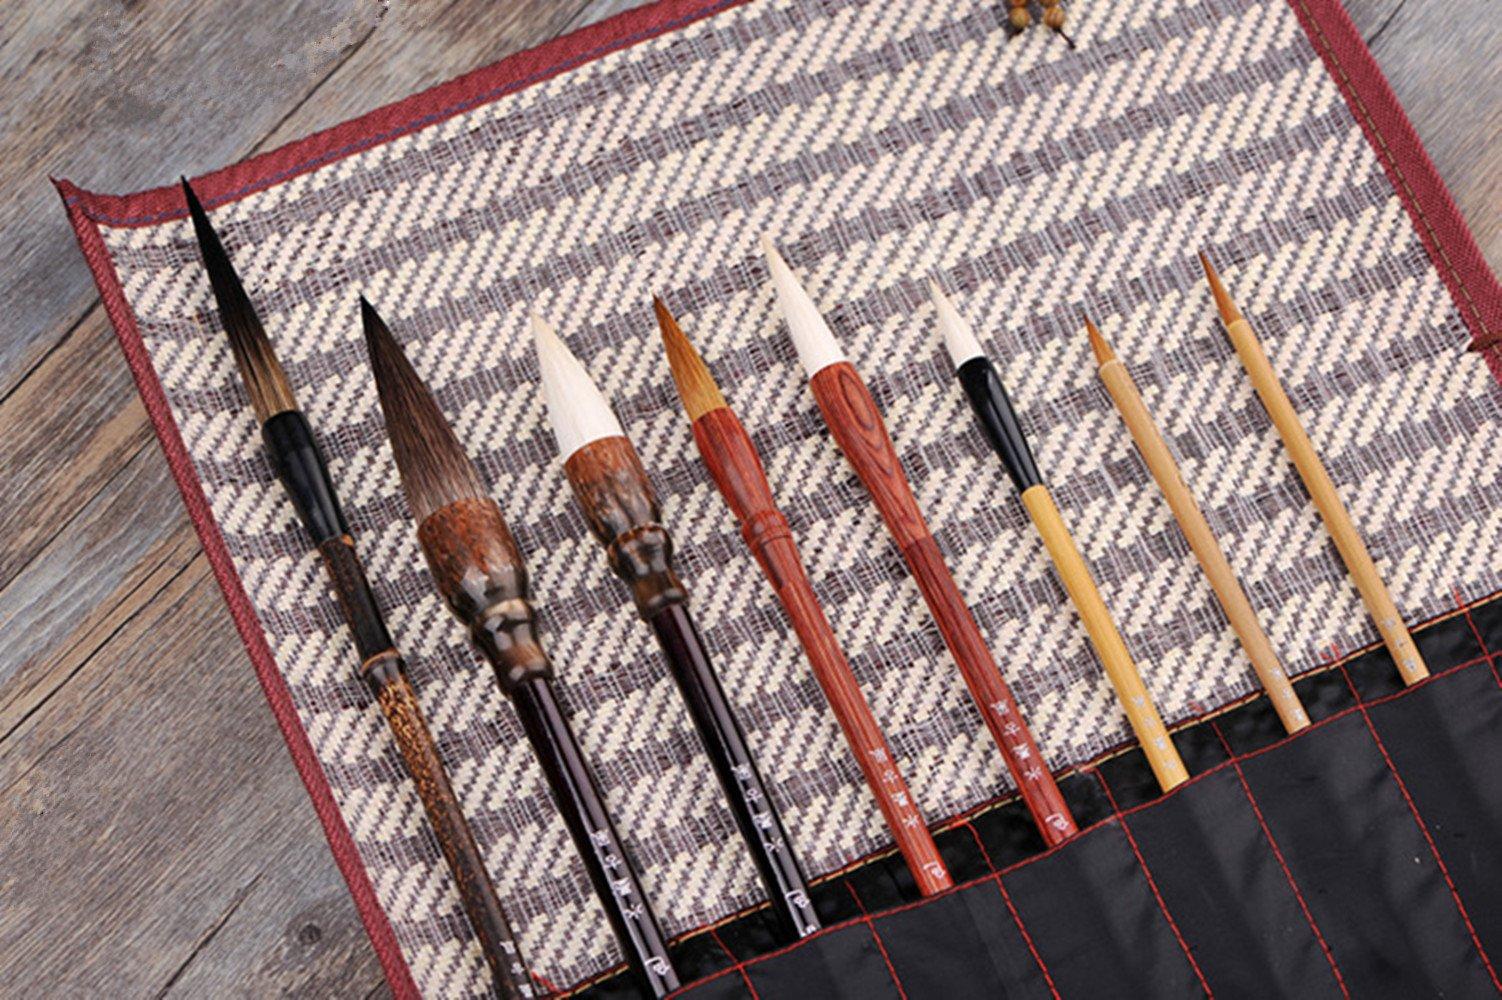 Hmayart MB029 Classic Brush Pen Set for Sumi-e Painting / 8 Brushes Plus 1 Bamboo Wrap by Hmayart